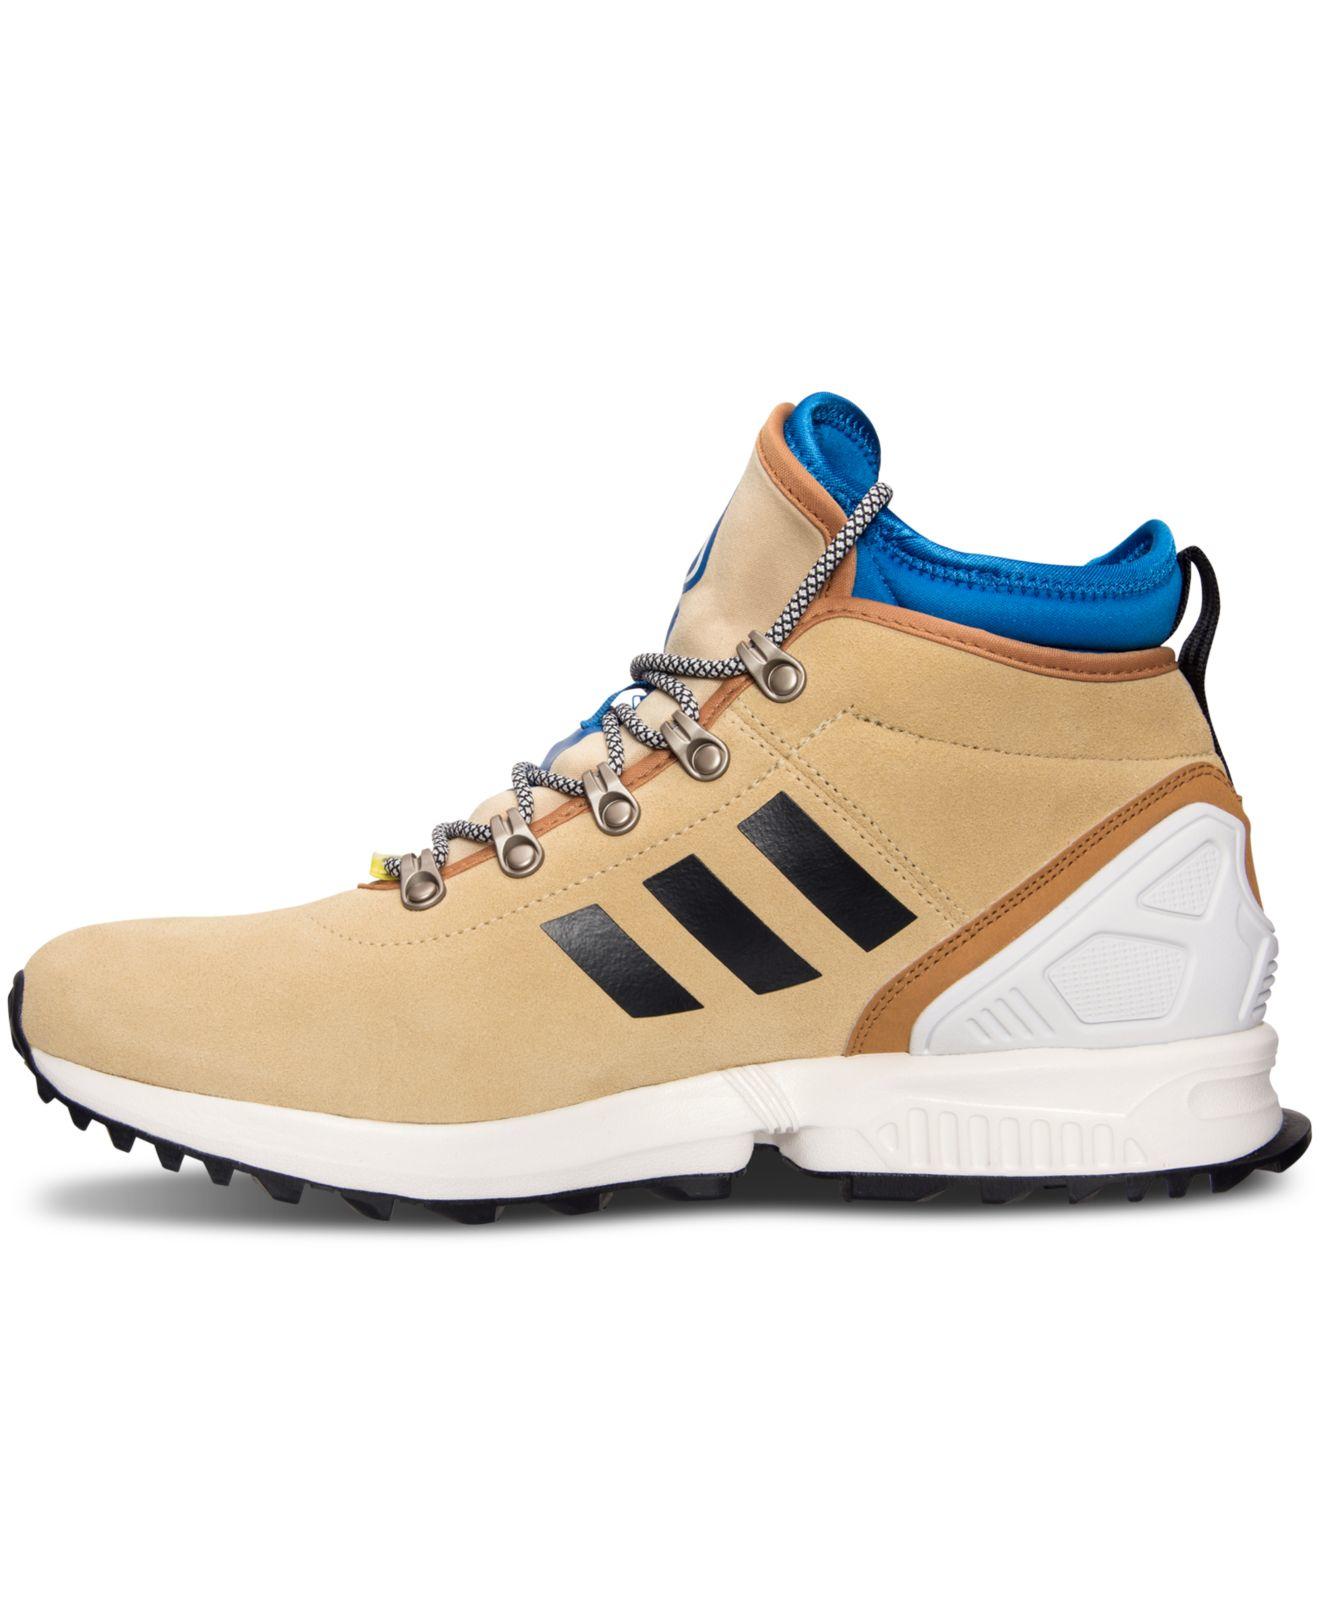 a48843a6fe47 ... inexpensive lyst adidas mens originals zx flux winter sneakerboots from  1083c 650ec ...